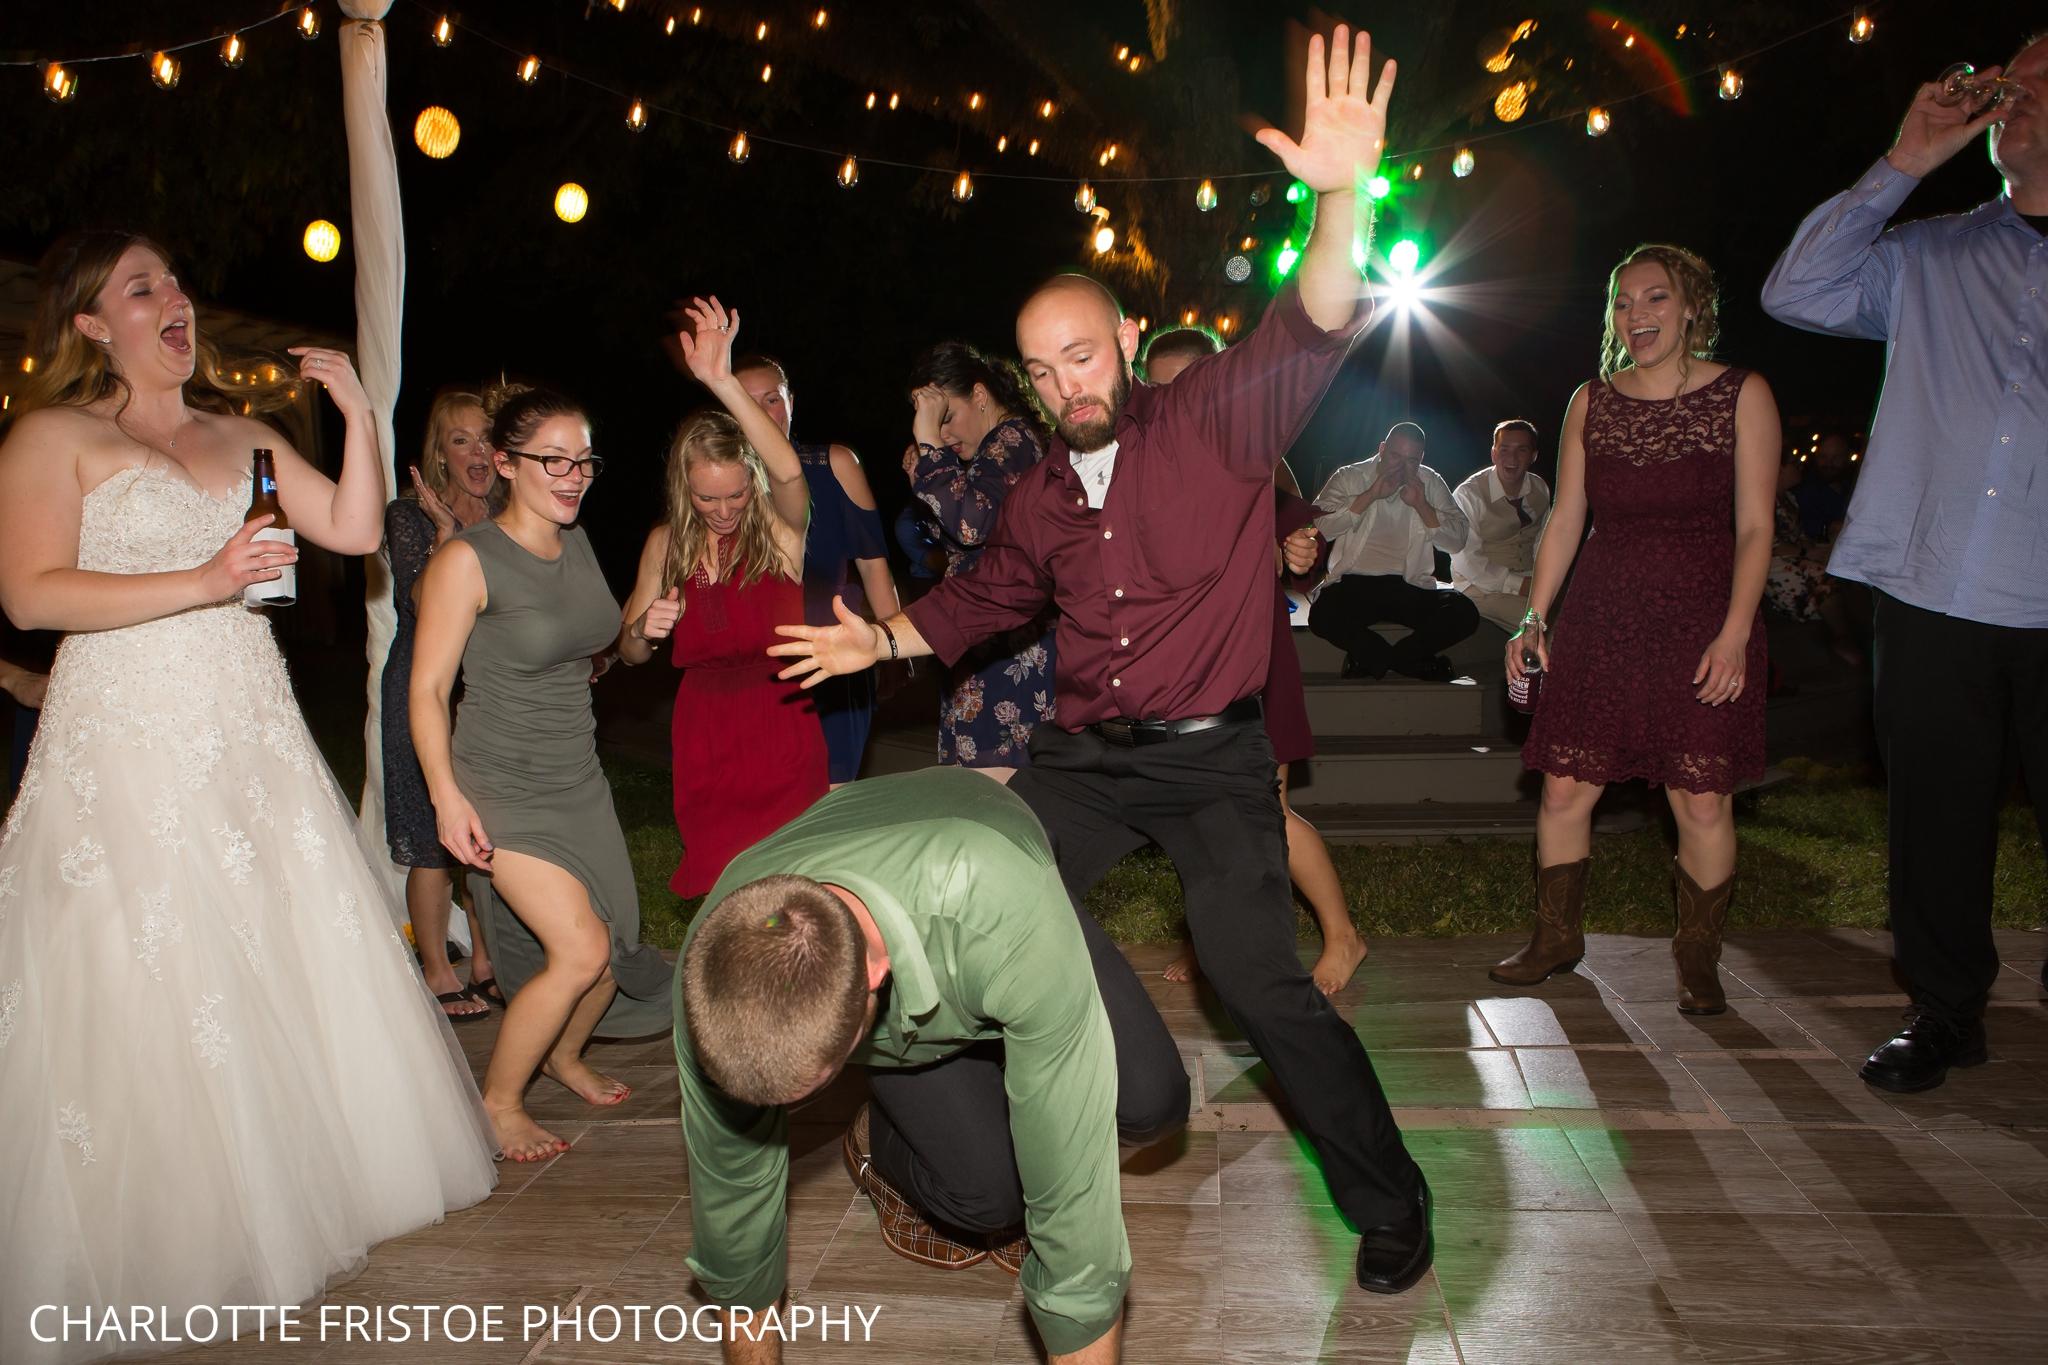 Tallahassee_Wedding_Charlotte_Fristoe-87.jpg